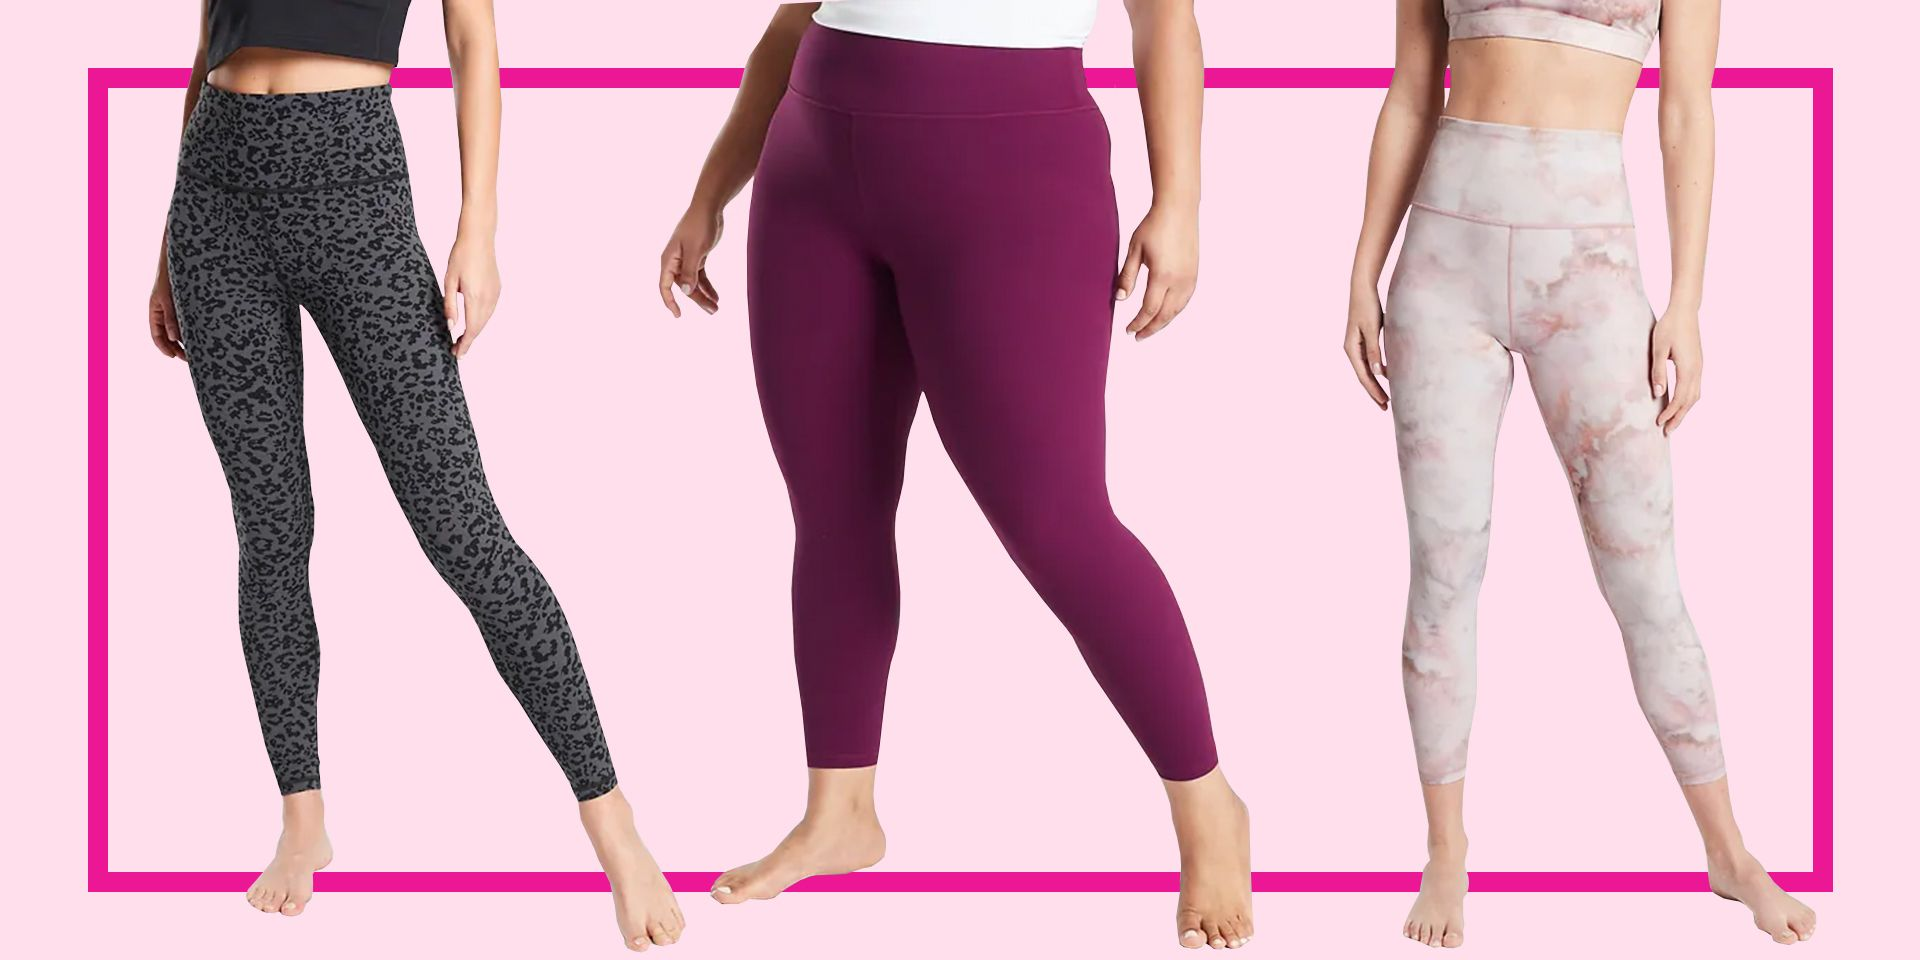 18 Leggings Like Lululemon Best Lululemon Alternatives